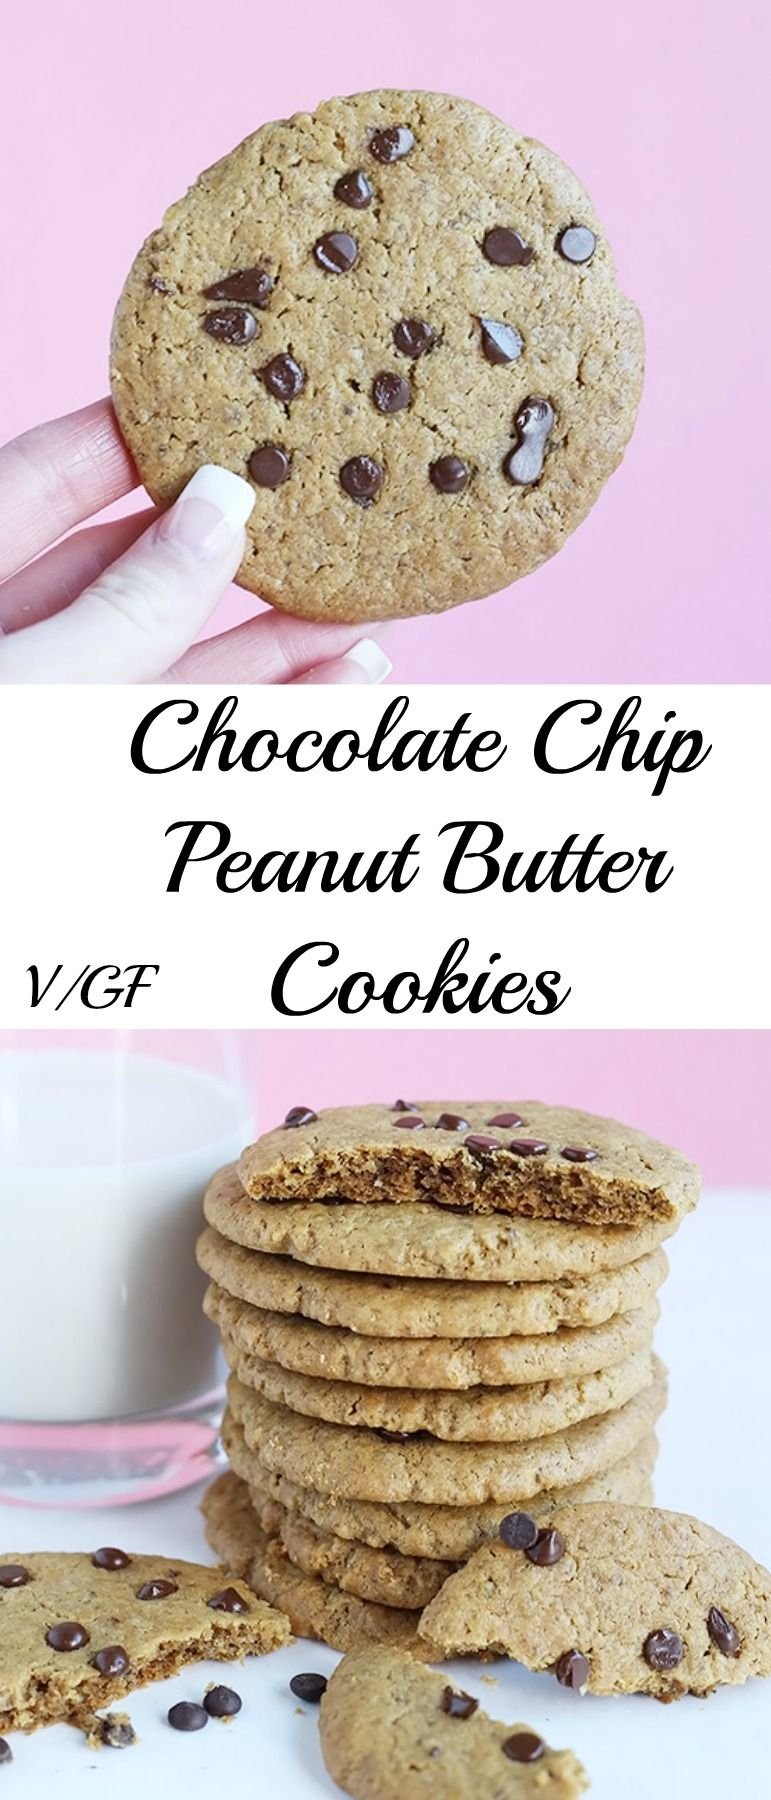 Chocolate chip peanut butter cookies tworaspberries